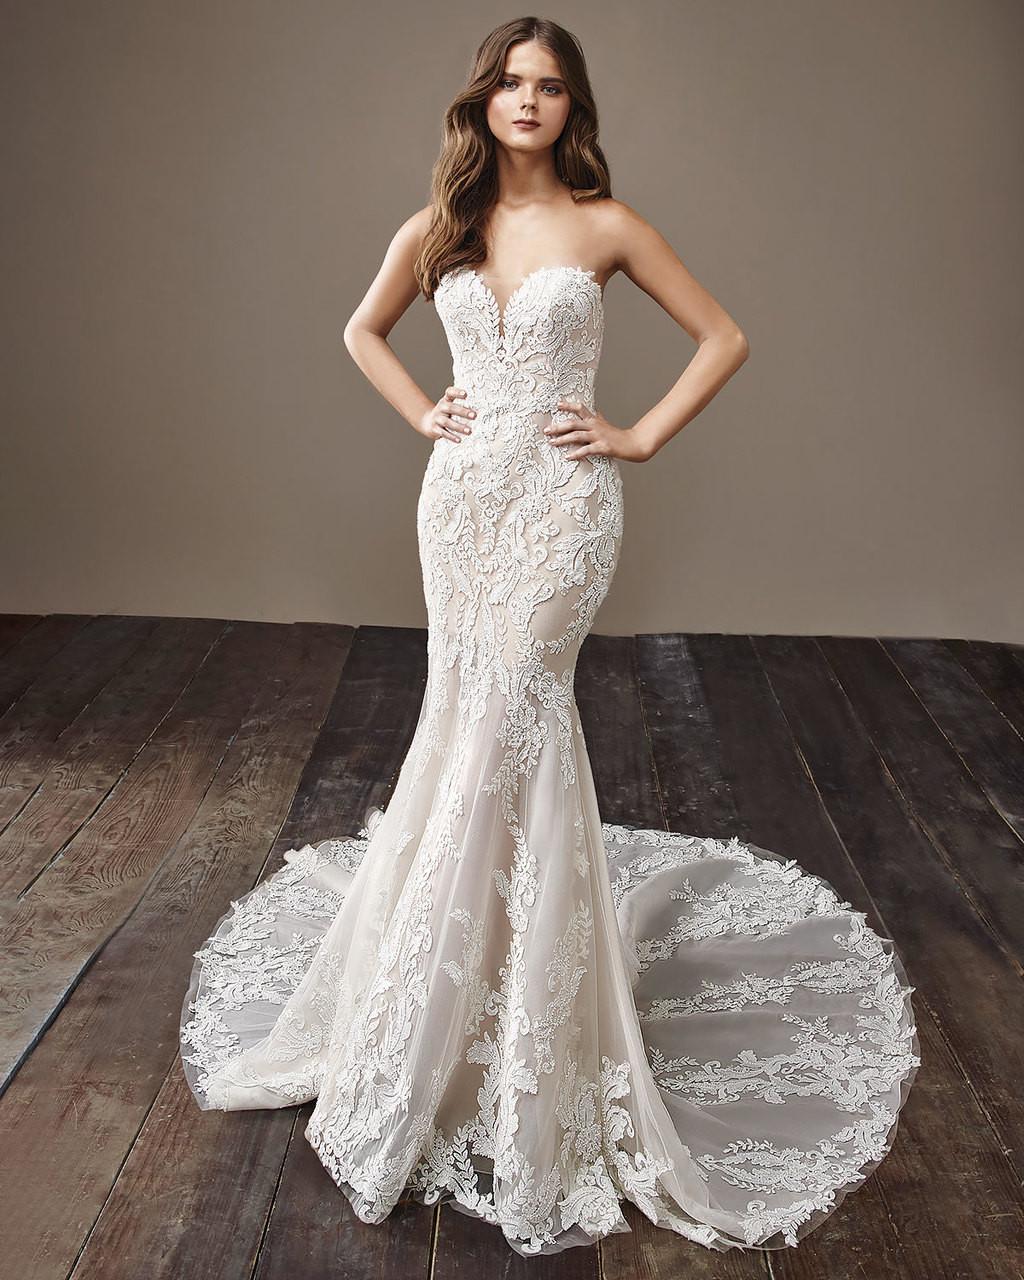 Bobbi By Badgley Mischka,Guest Wedding Dresses For Men